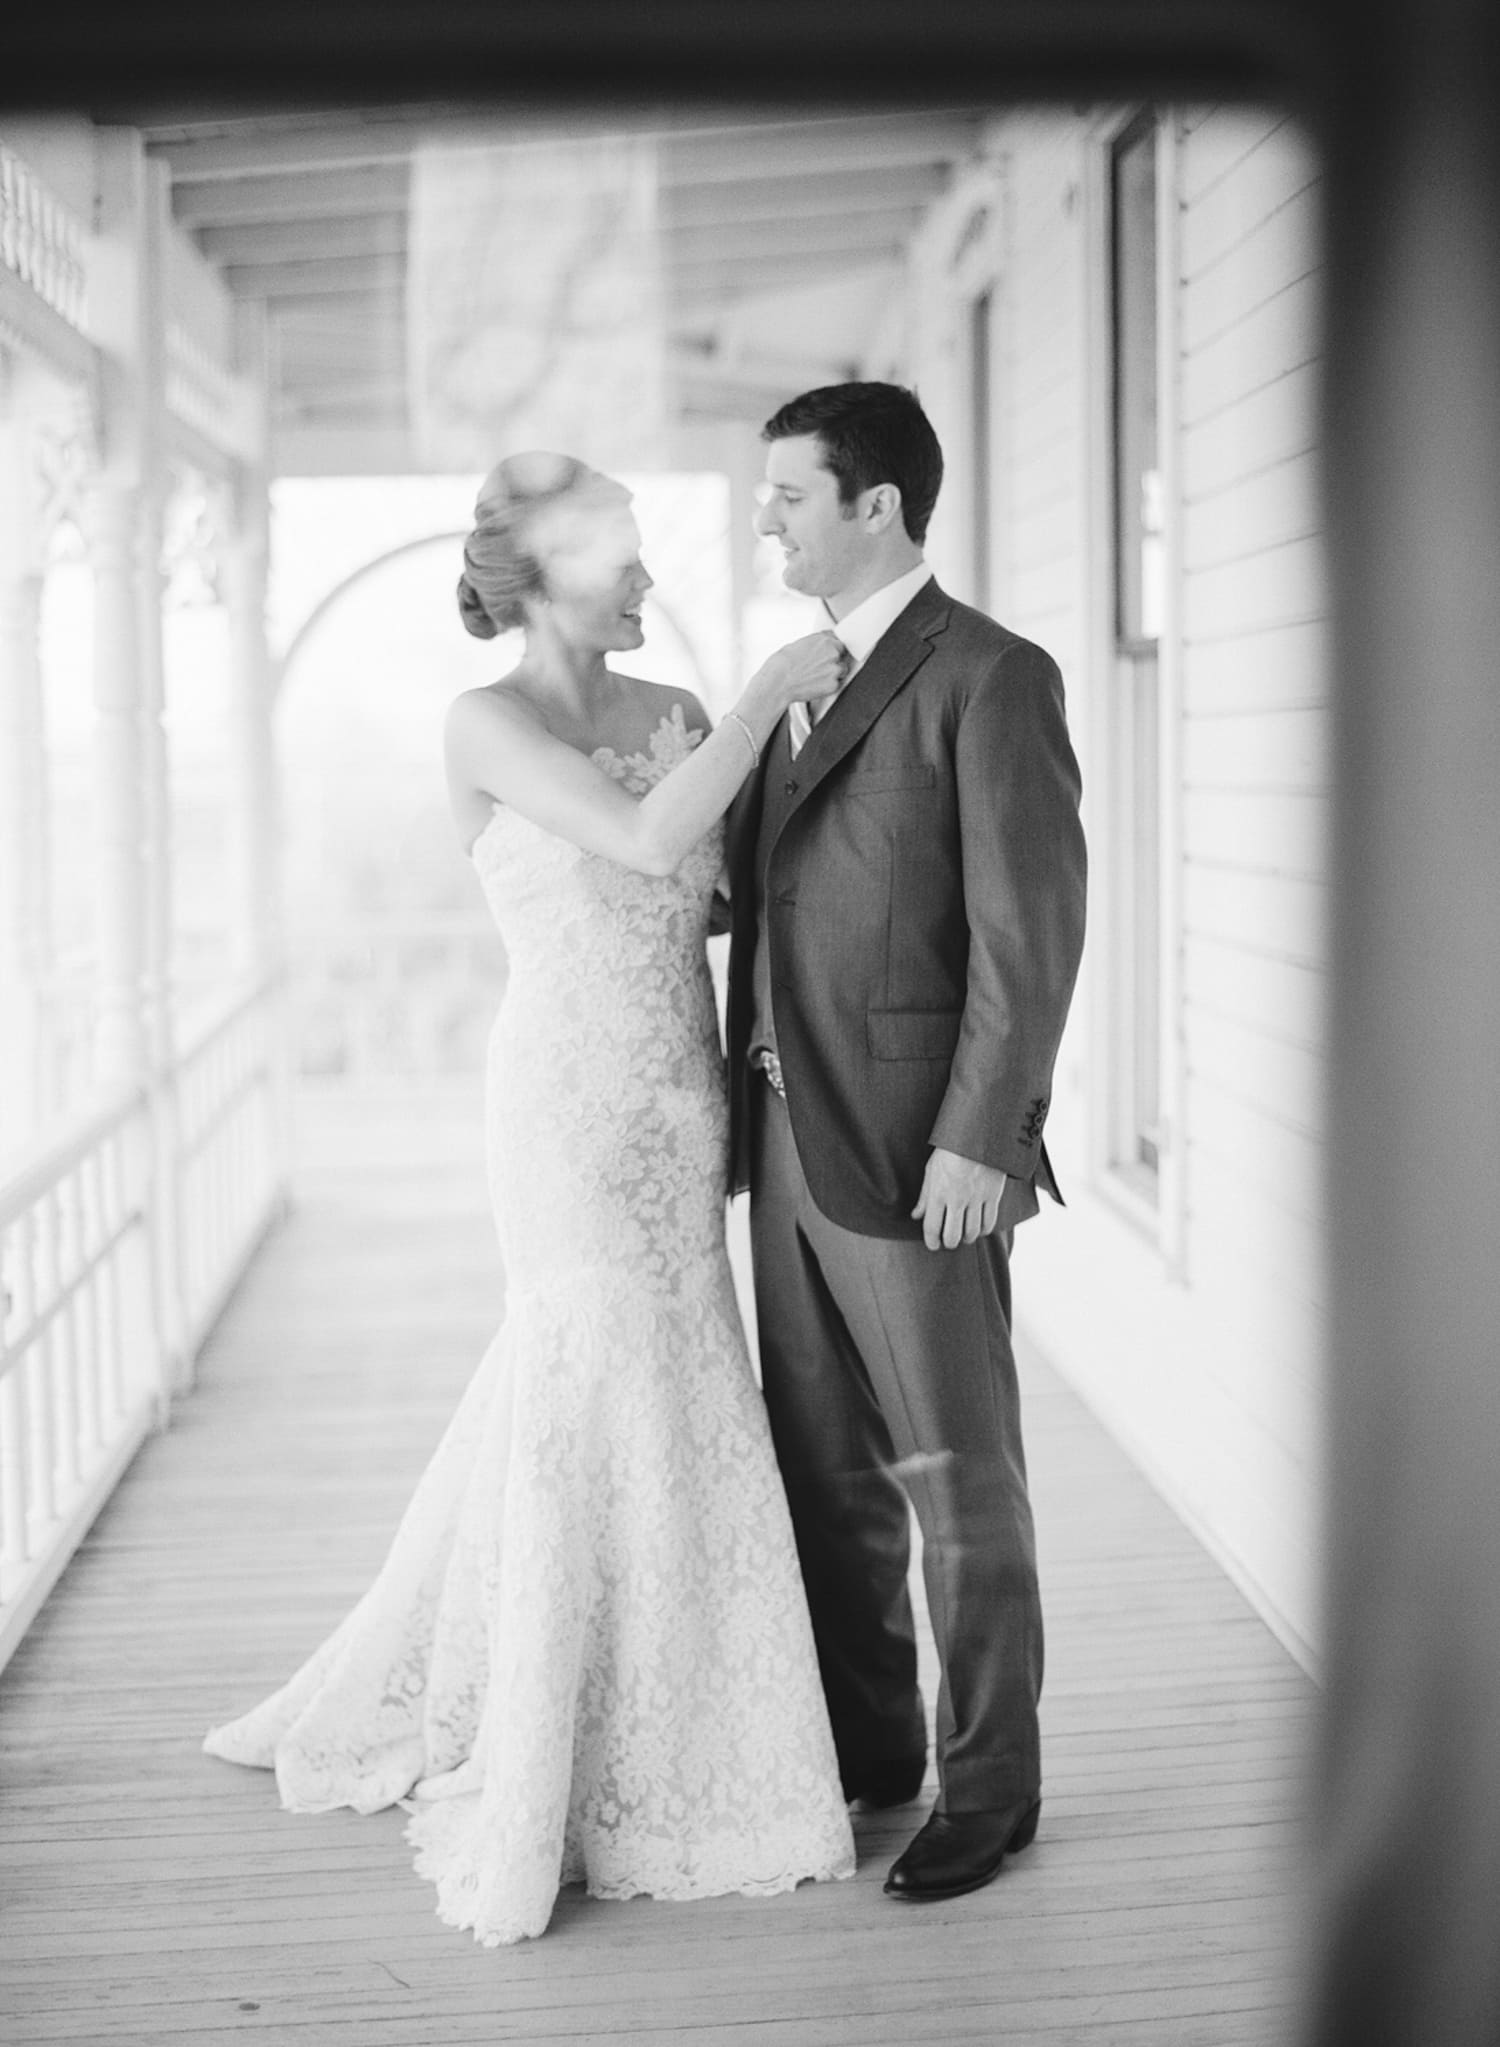 barr-mansion-wedding-39.jpg